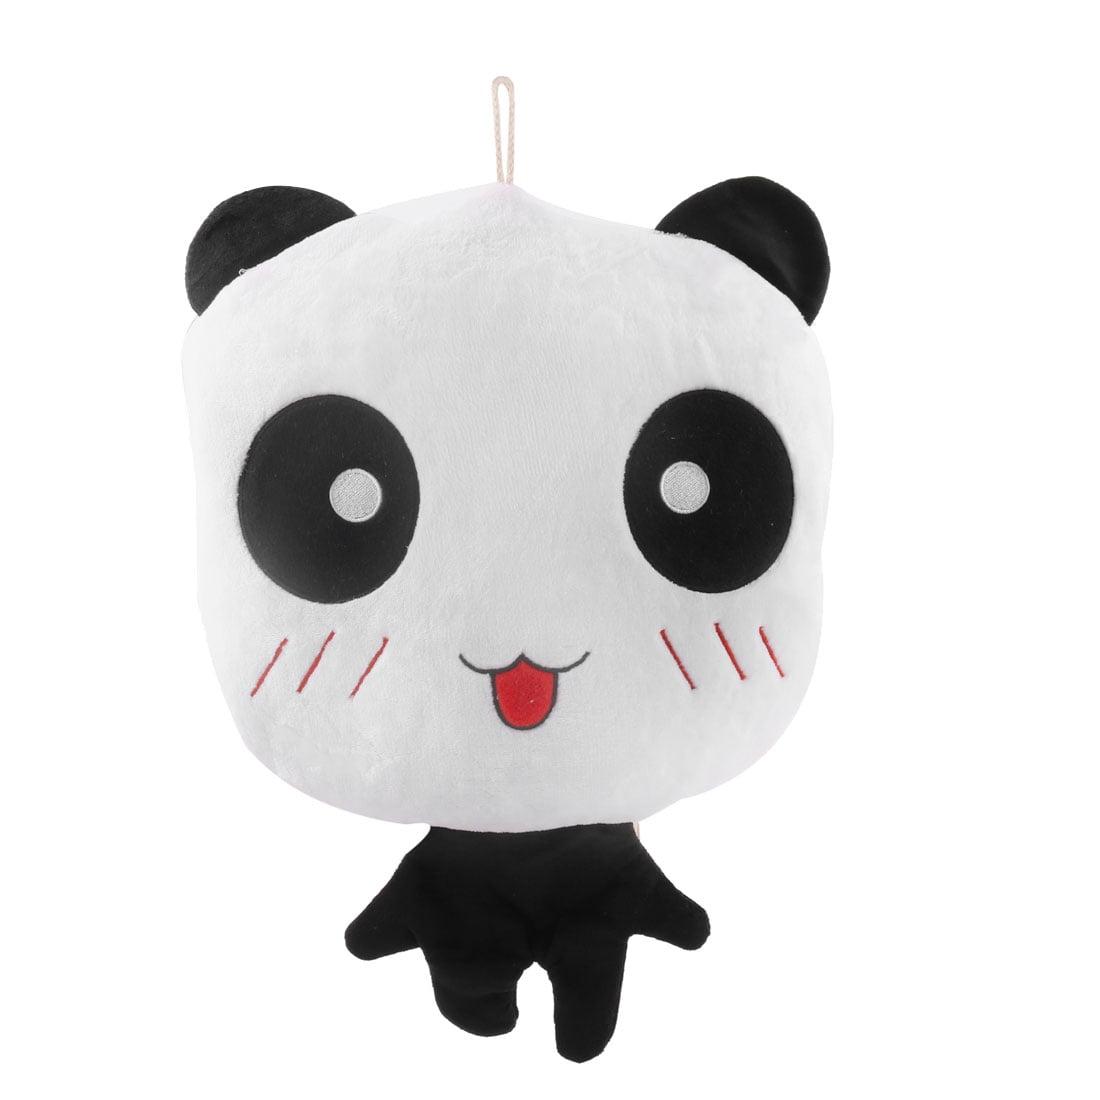 Shy Panda Design Super Soft Warm Foldable Throw Sofa Travel Quilt Blanket Pillow